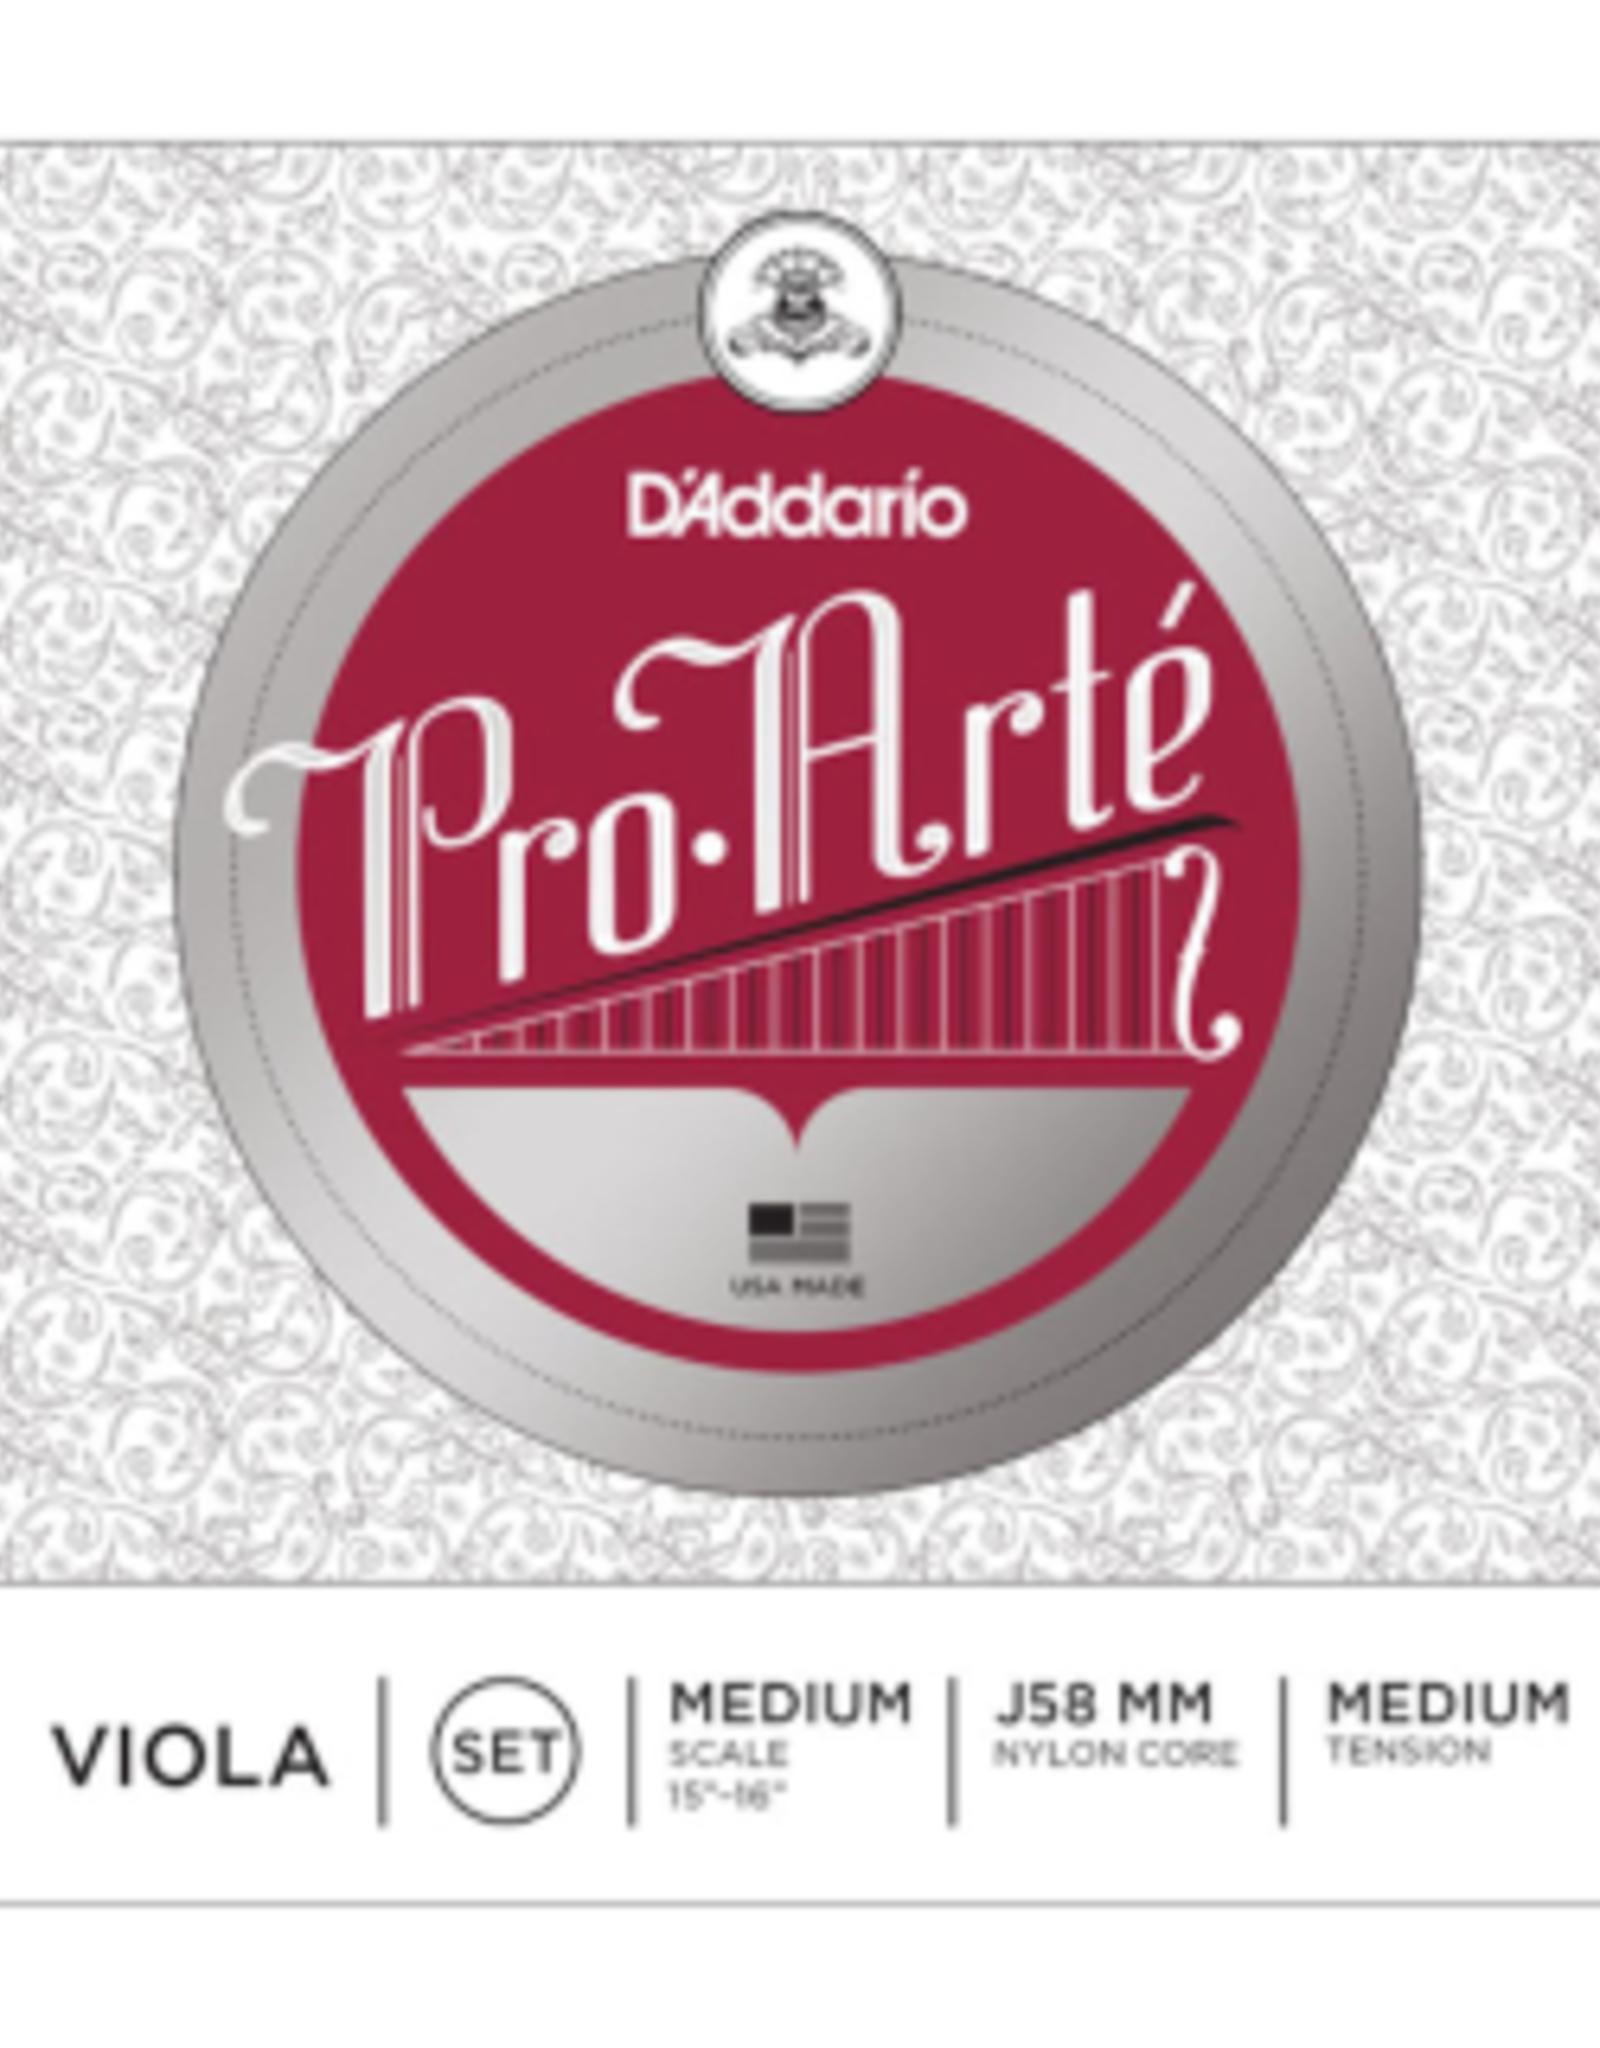 DADDARIO Pro Arte snaar voor altviool, do (C-4) 14-15, medium, silver - art. J5804-SM